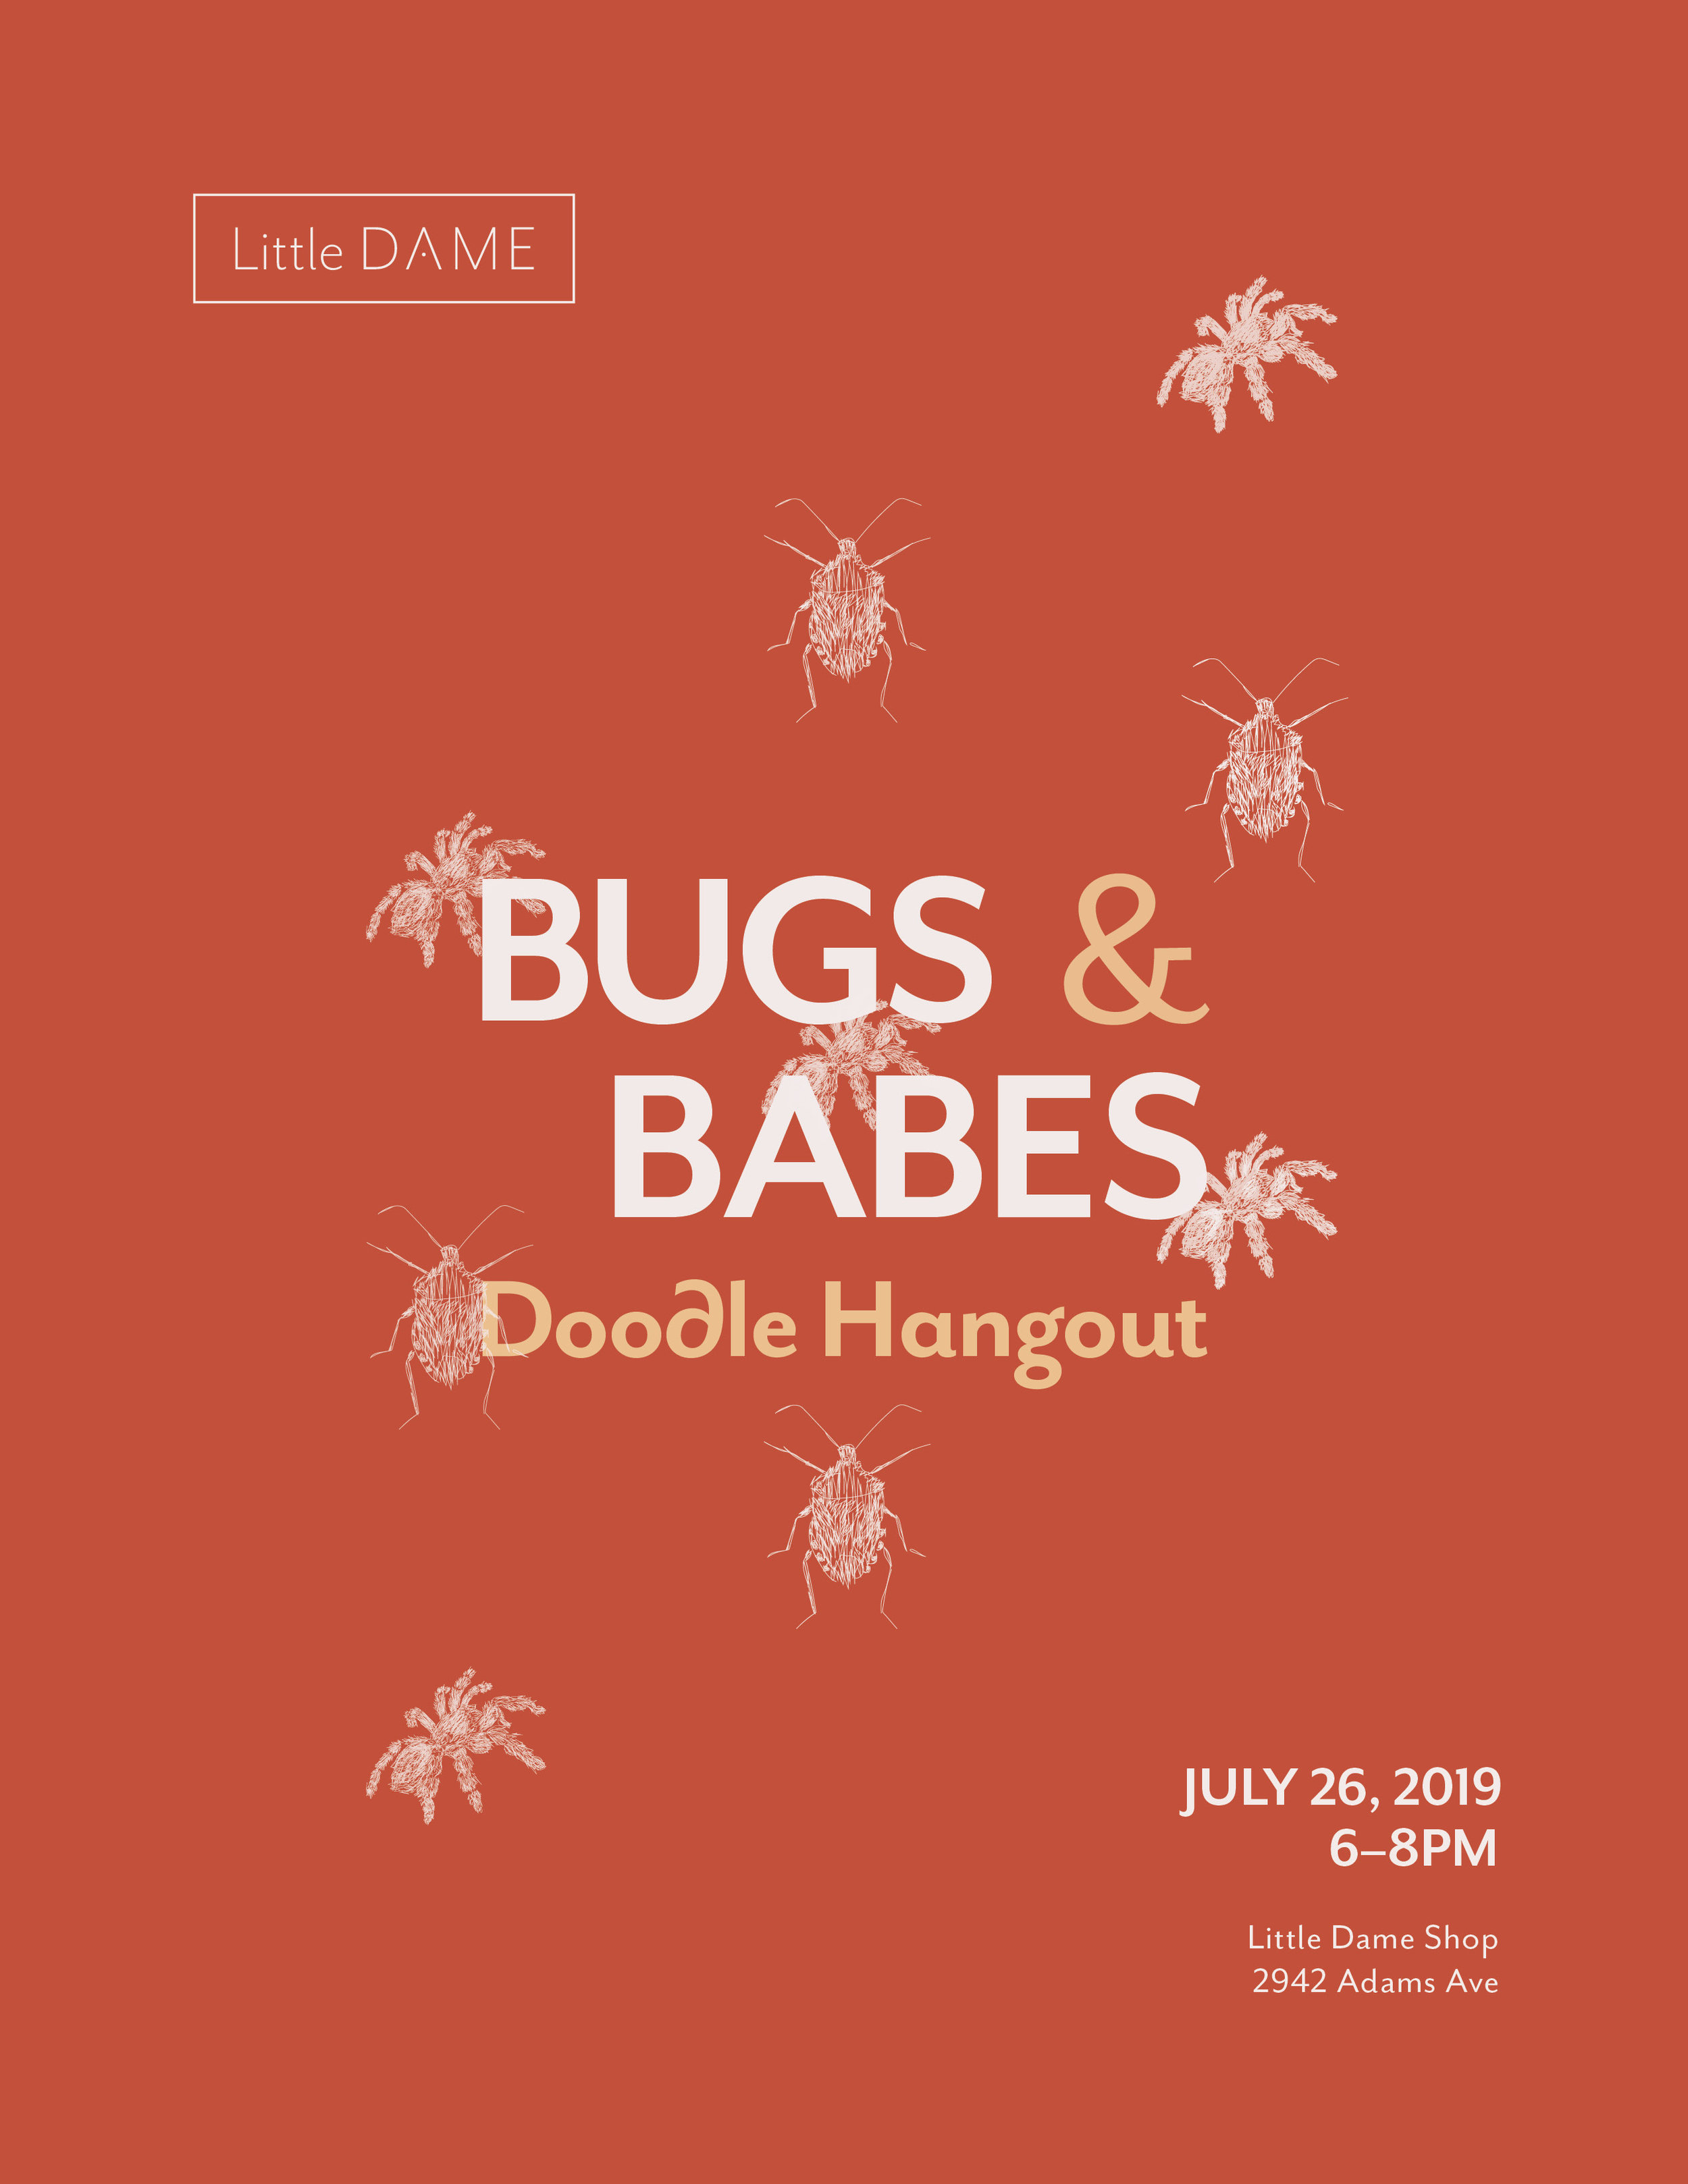 Little Dame | Bugs & Babes | Feels Design Studio, July 2019